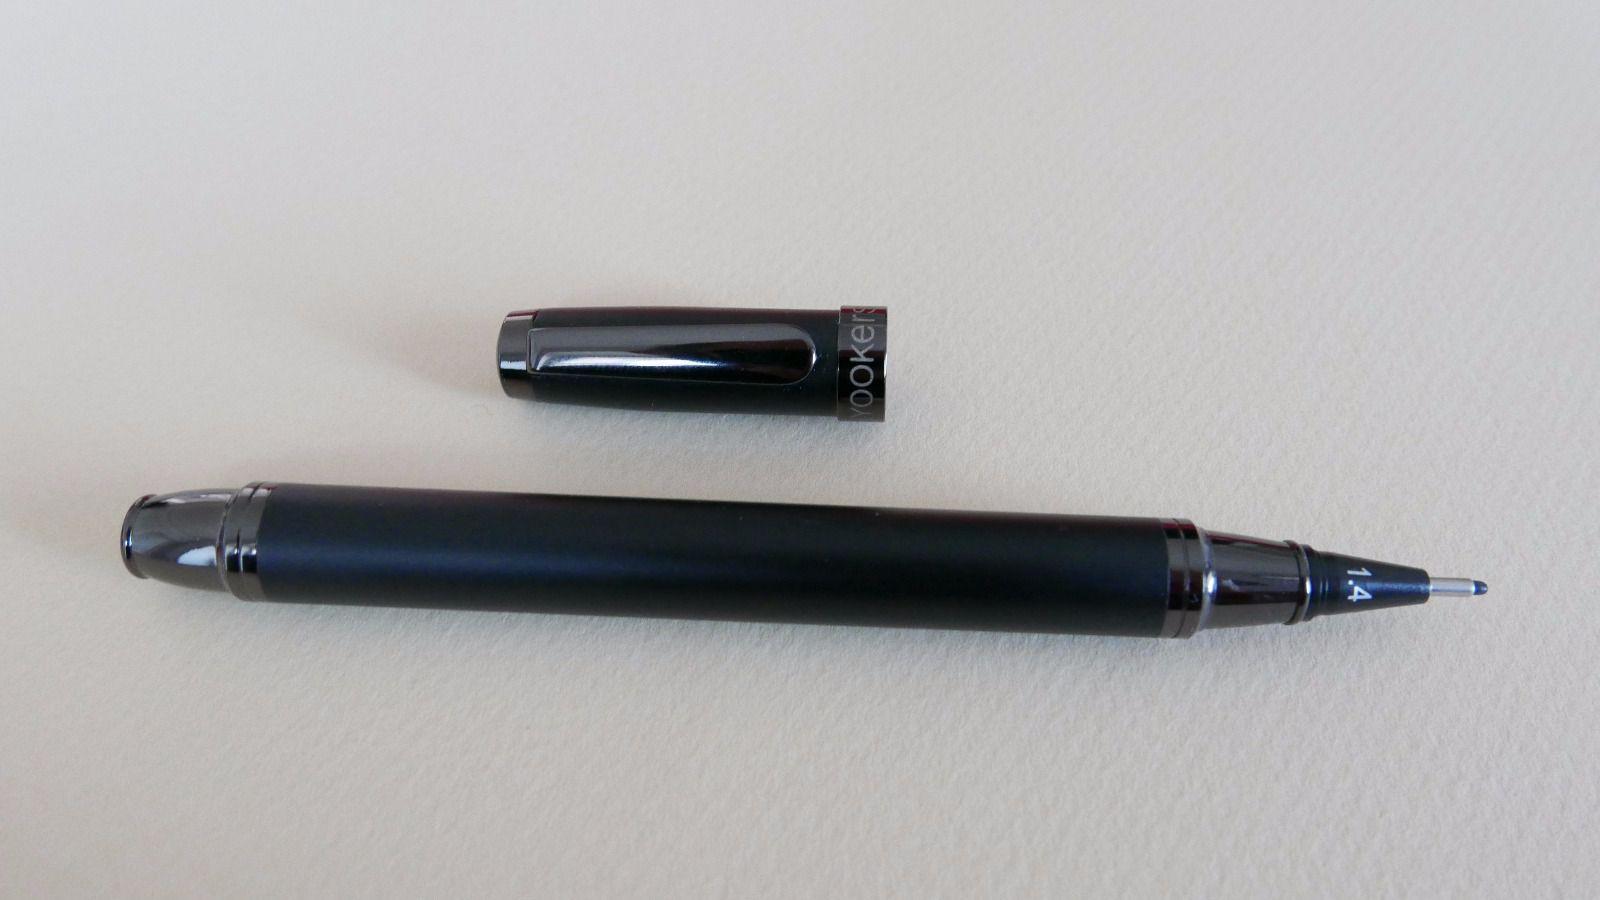 Yookers Fiberpen Elios preto fosco C/ Conversor De Tinta